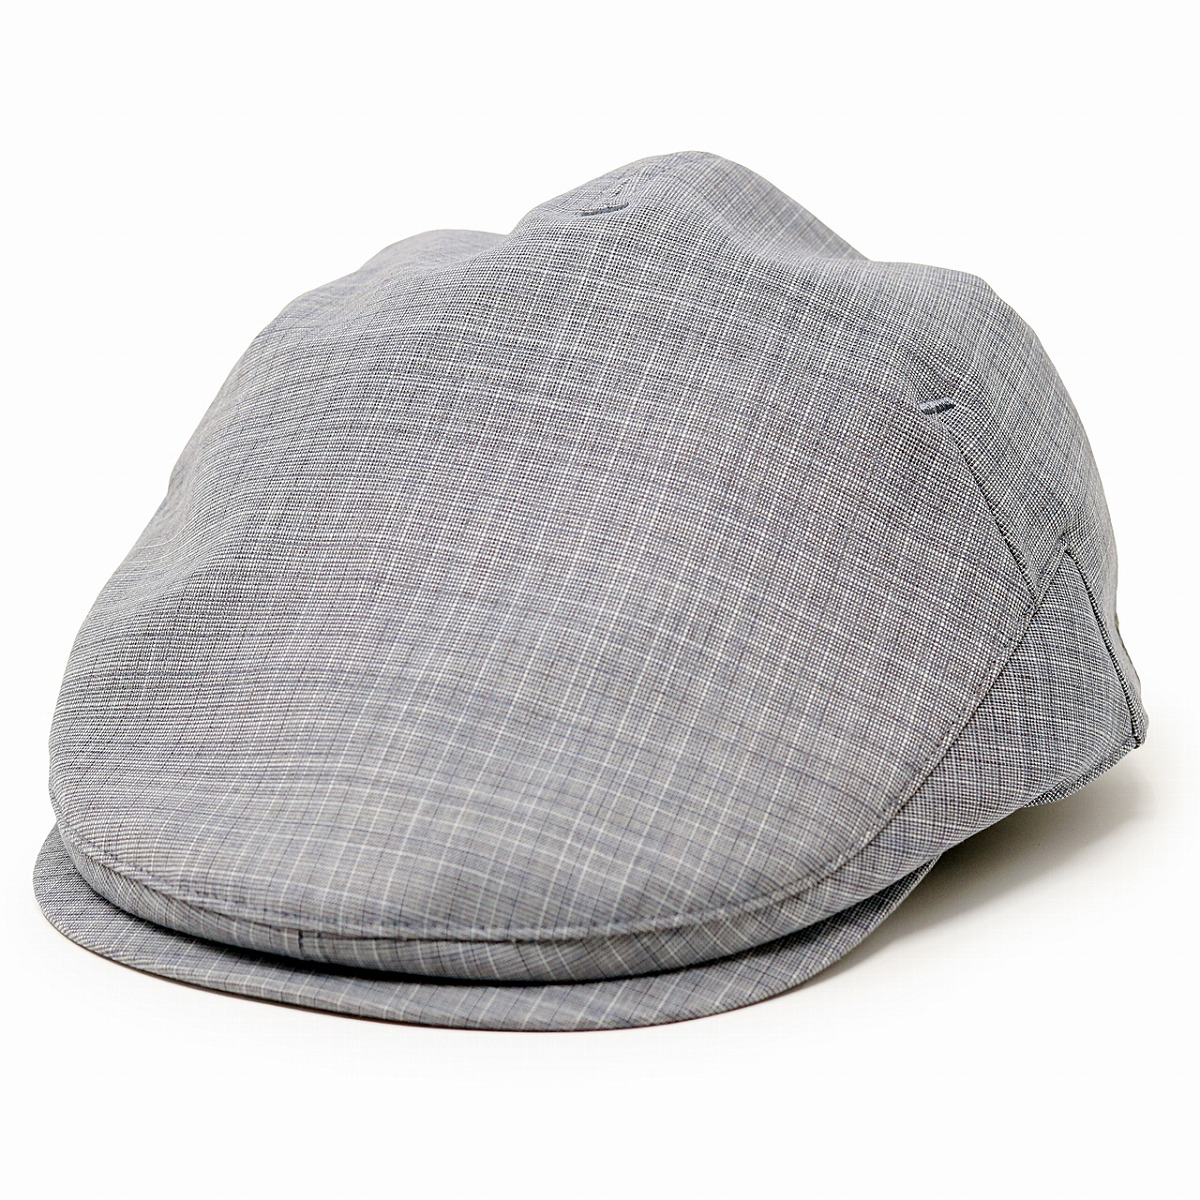 e3bd1a6166c ... It is a gift present in natural fiber Shin pull plain fabric daks  hunting cap hat ...